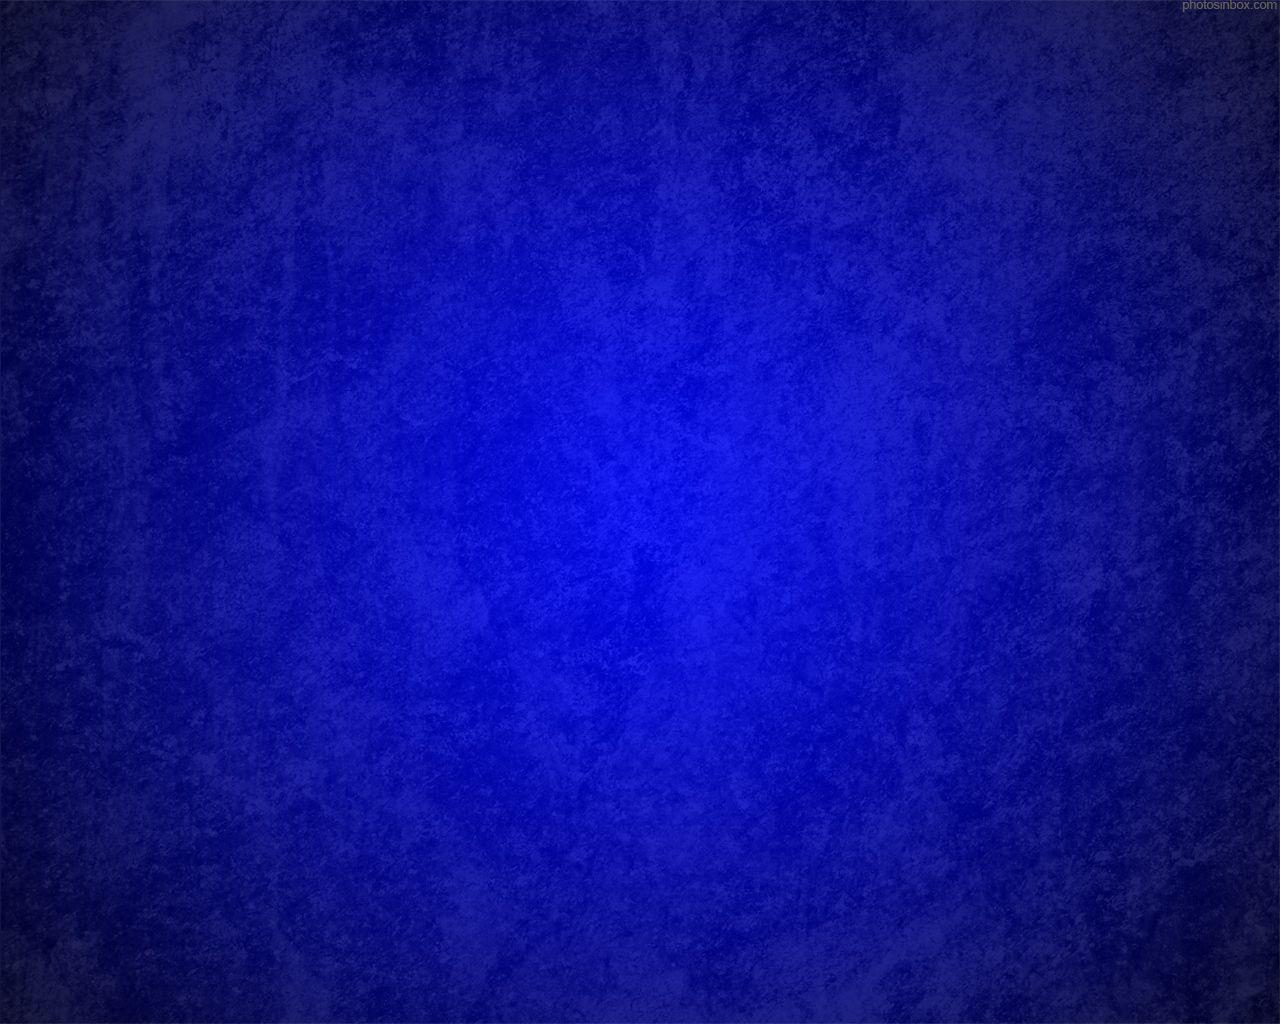 Blue Wallpaper Royal Background